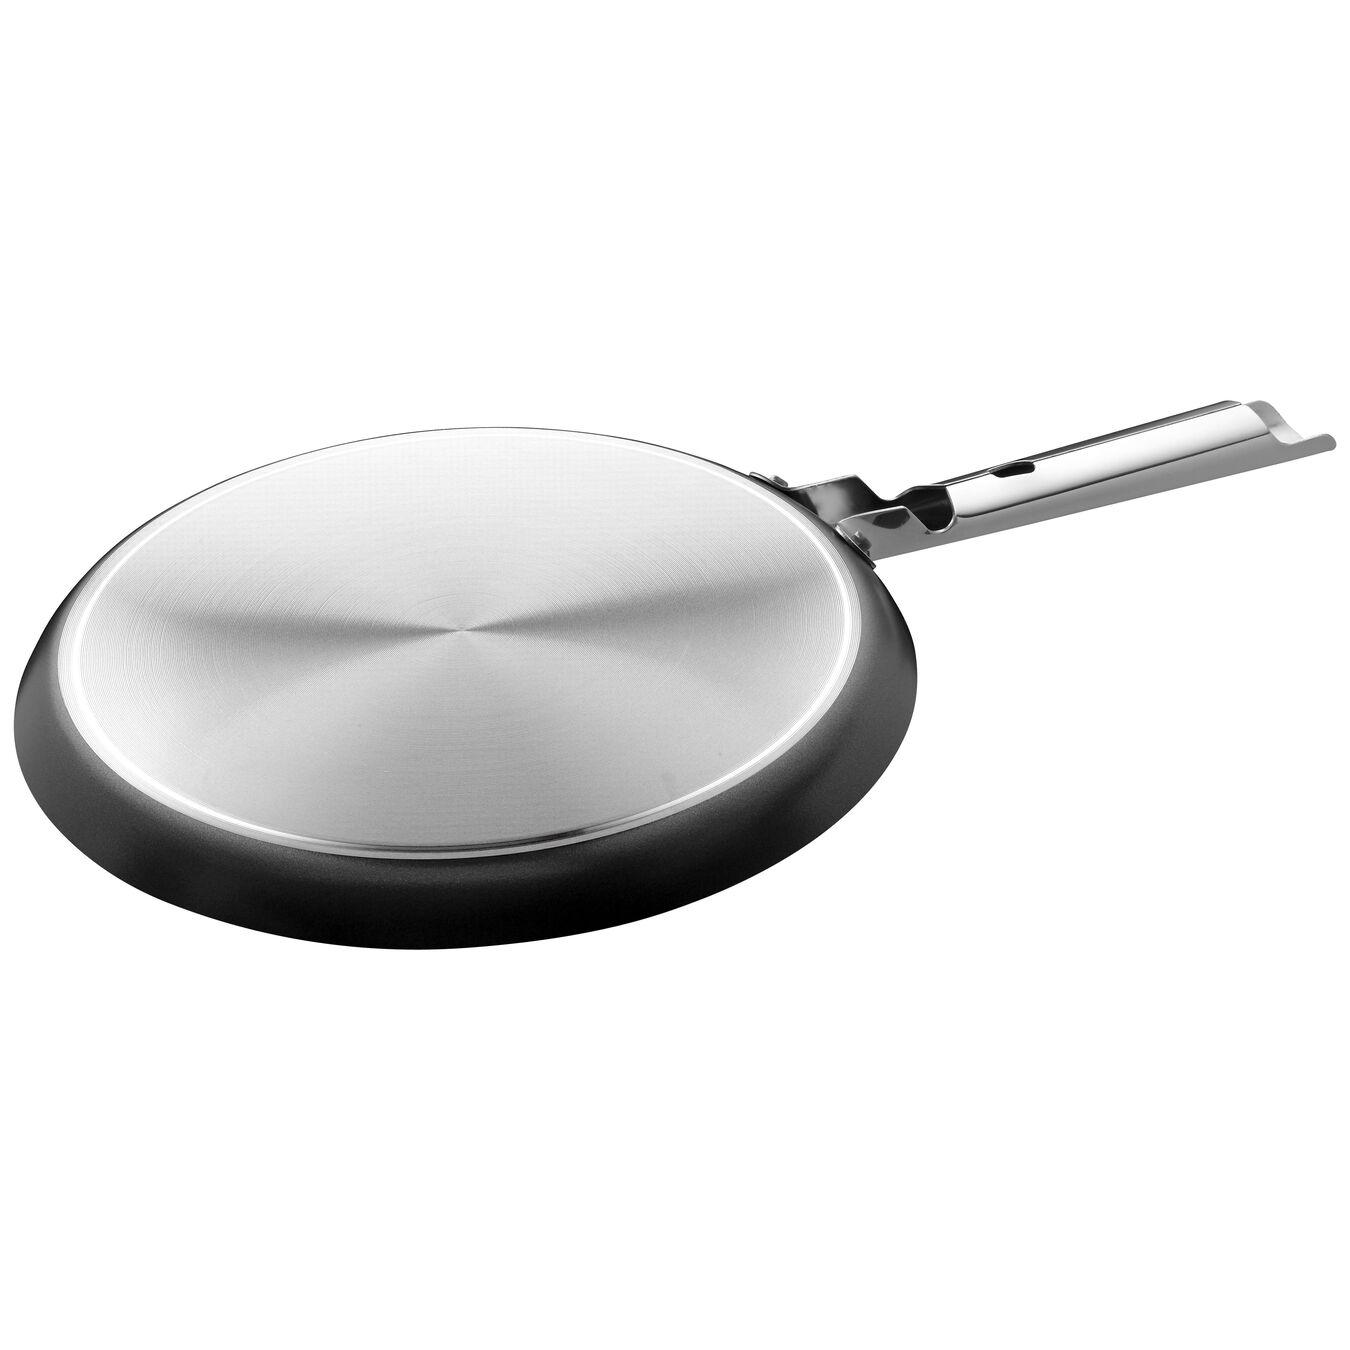 Crêpes-Pfanne 25 cm, Aluminium, Schwarz,,large 4